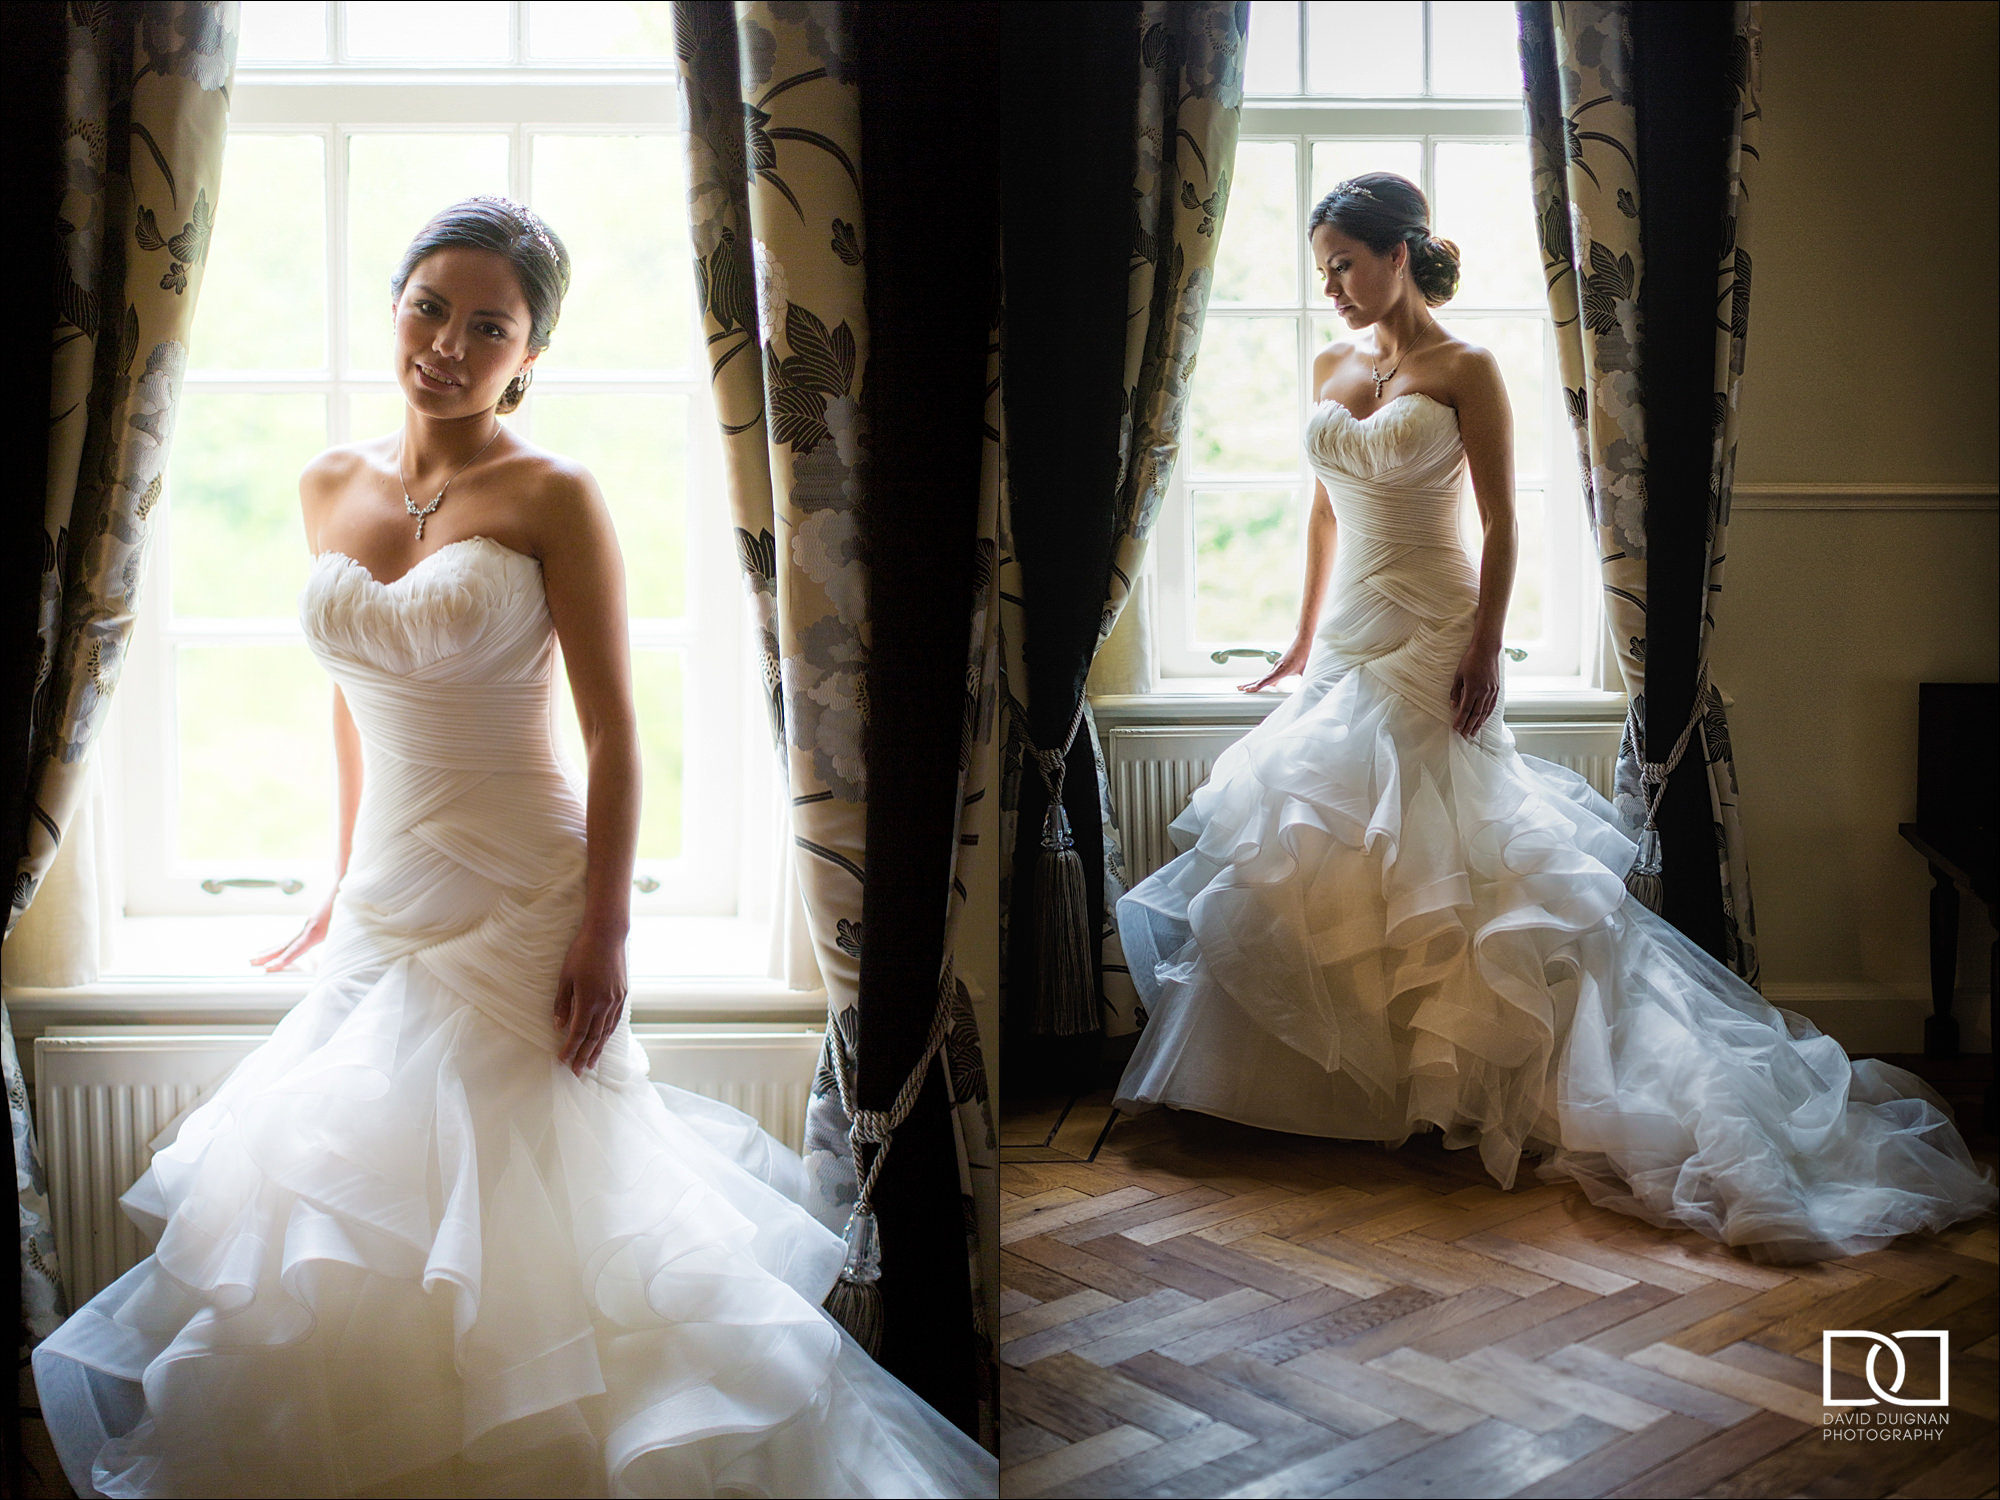 dublin wedding photographer david duignan photography wedding photos 0006